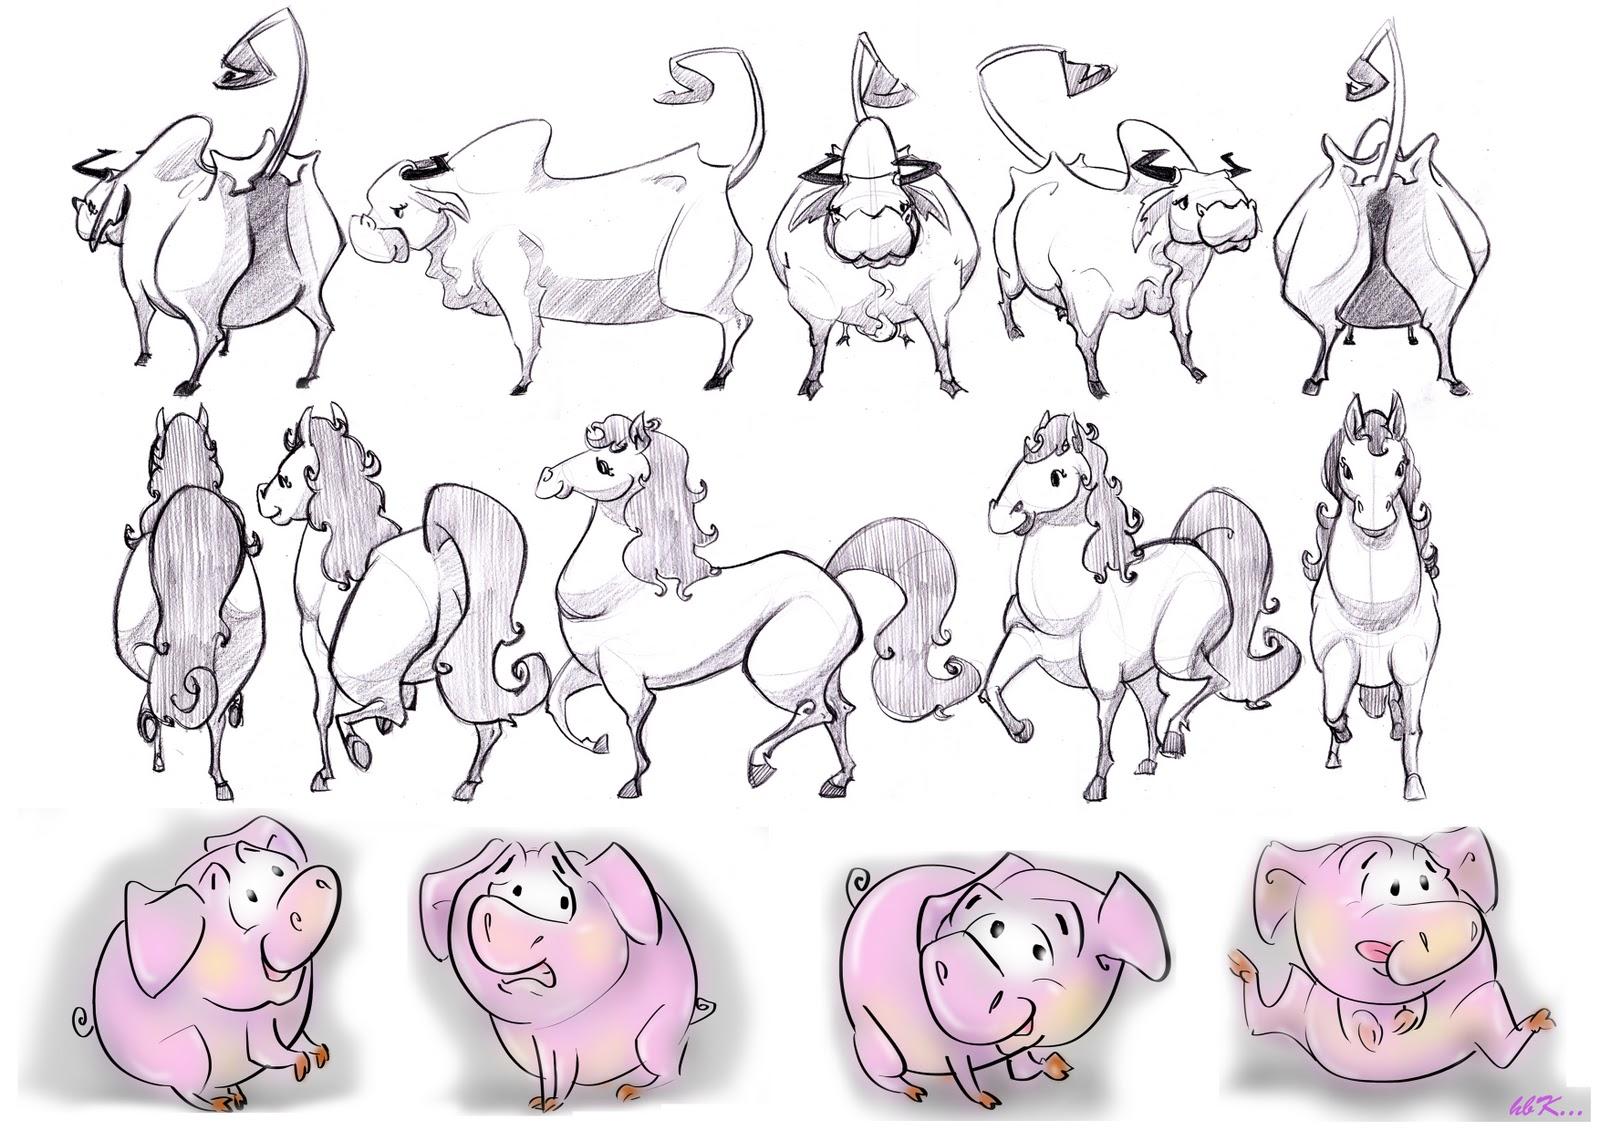 Character Design Genres : Bloomingsun studio character design all styles